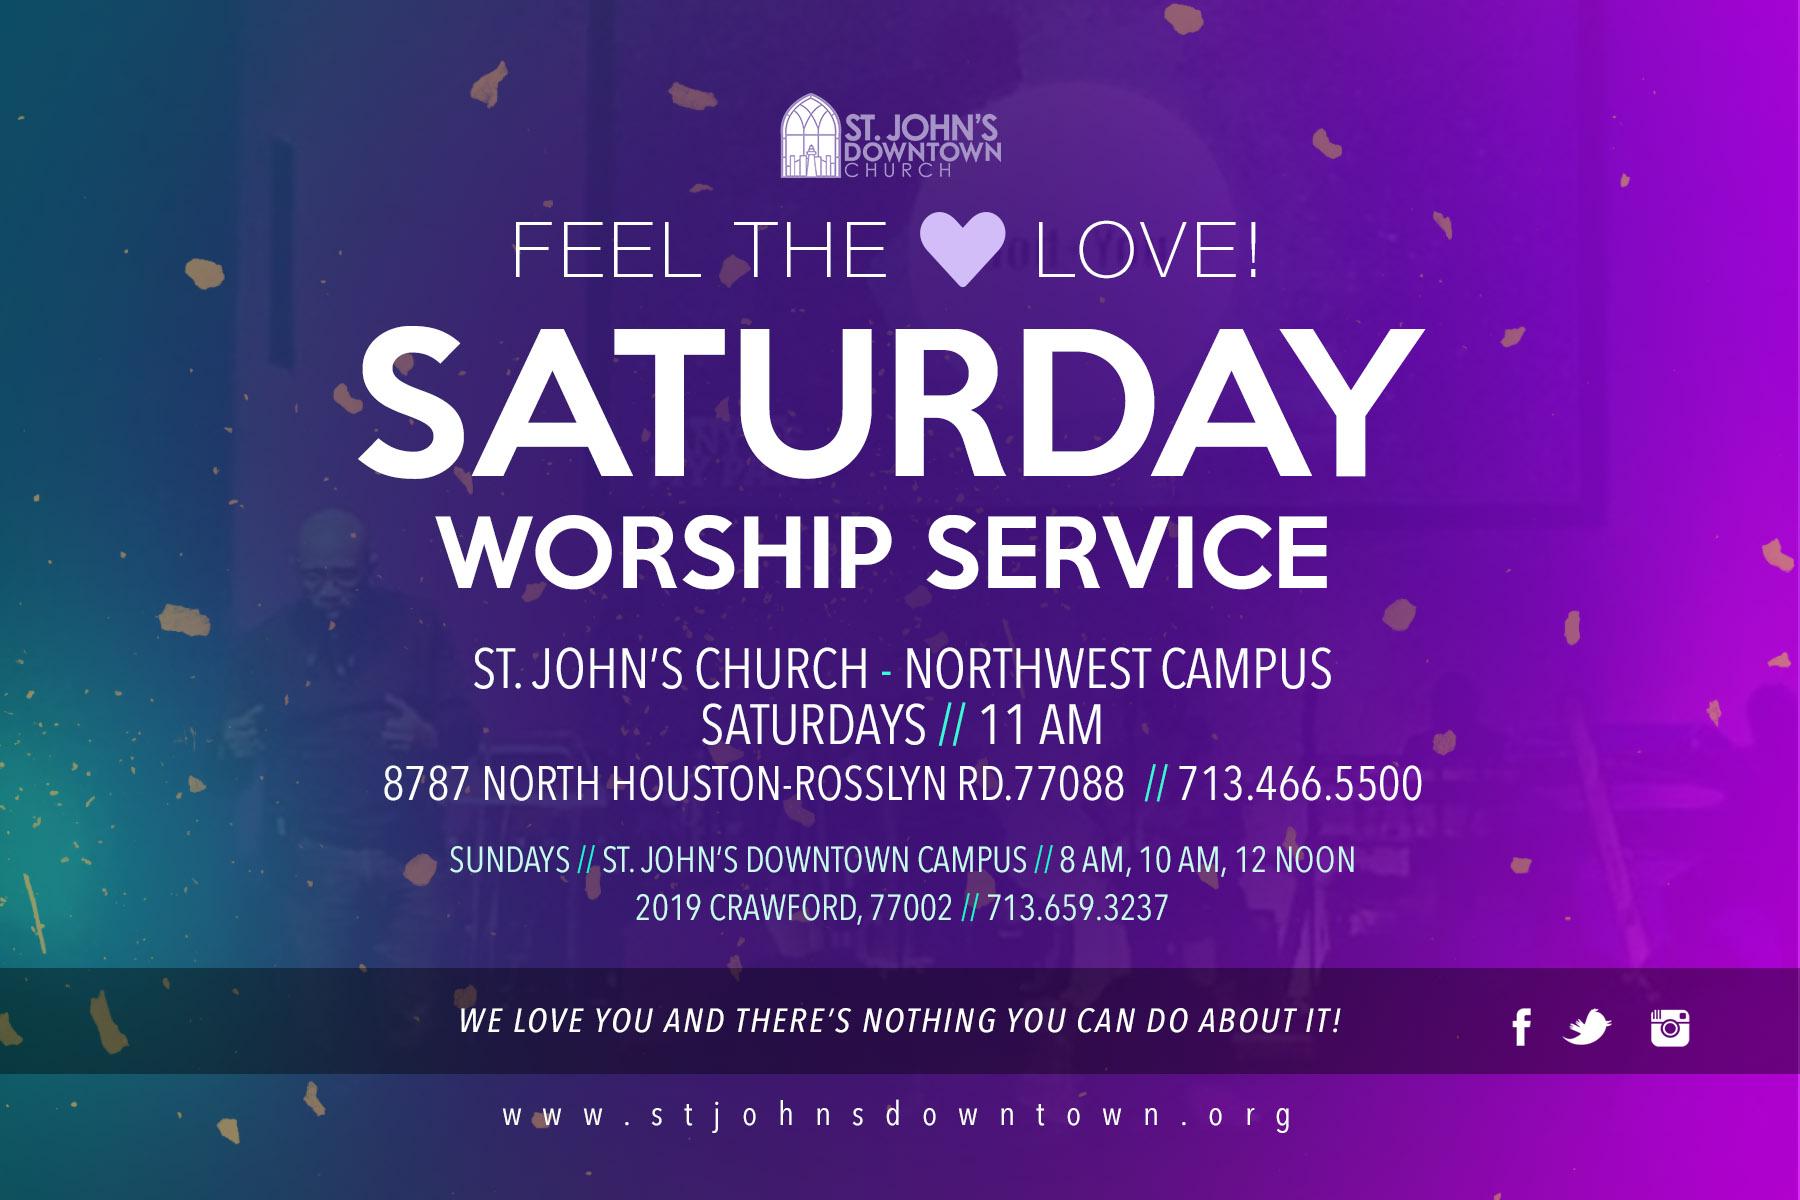 Worship Service flyer